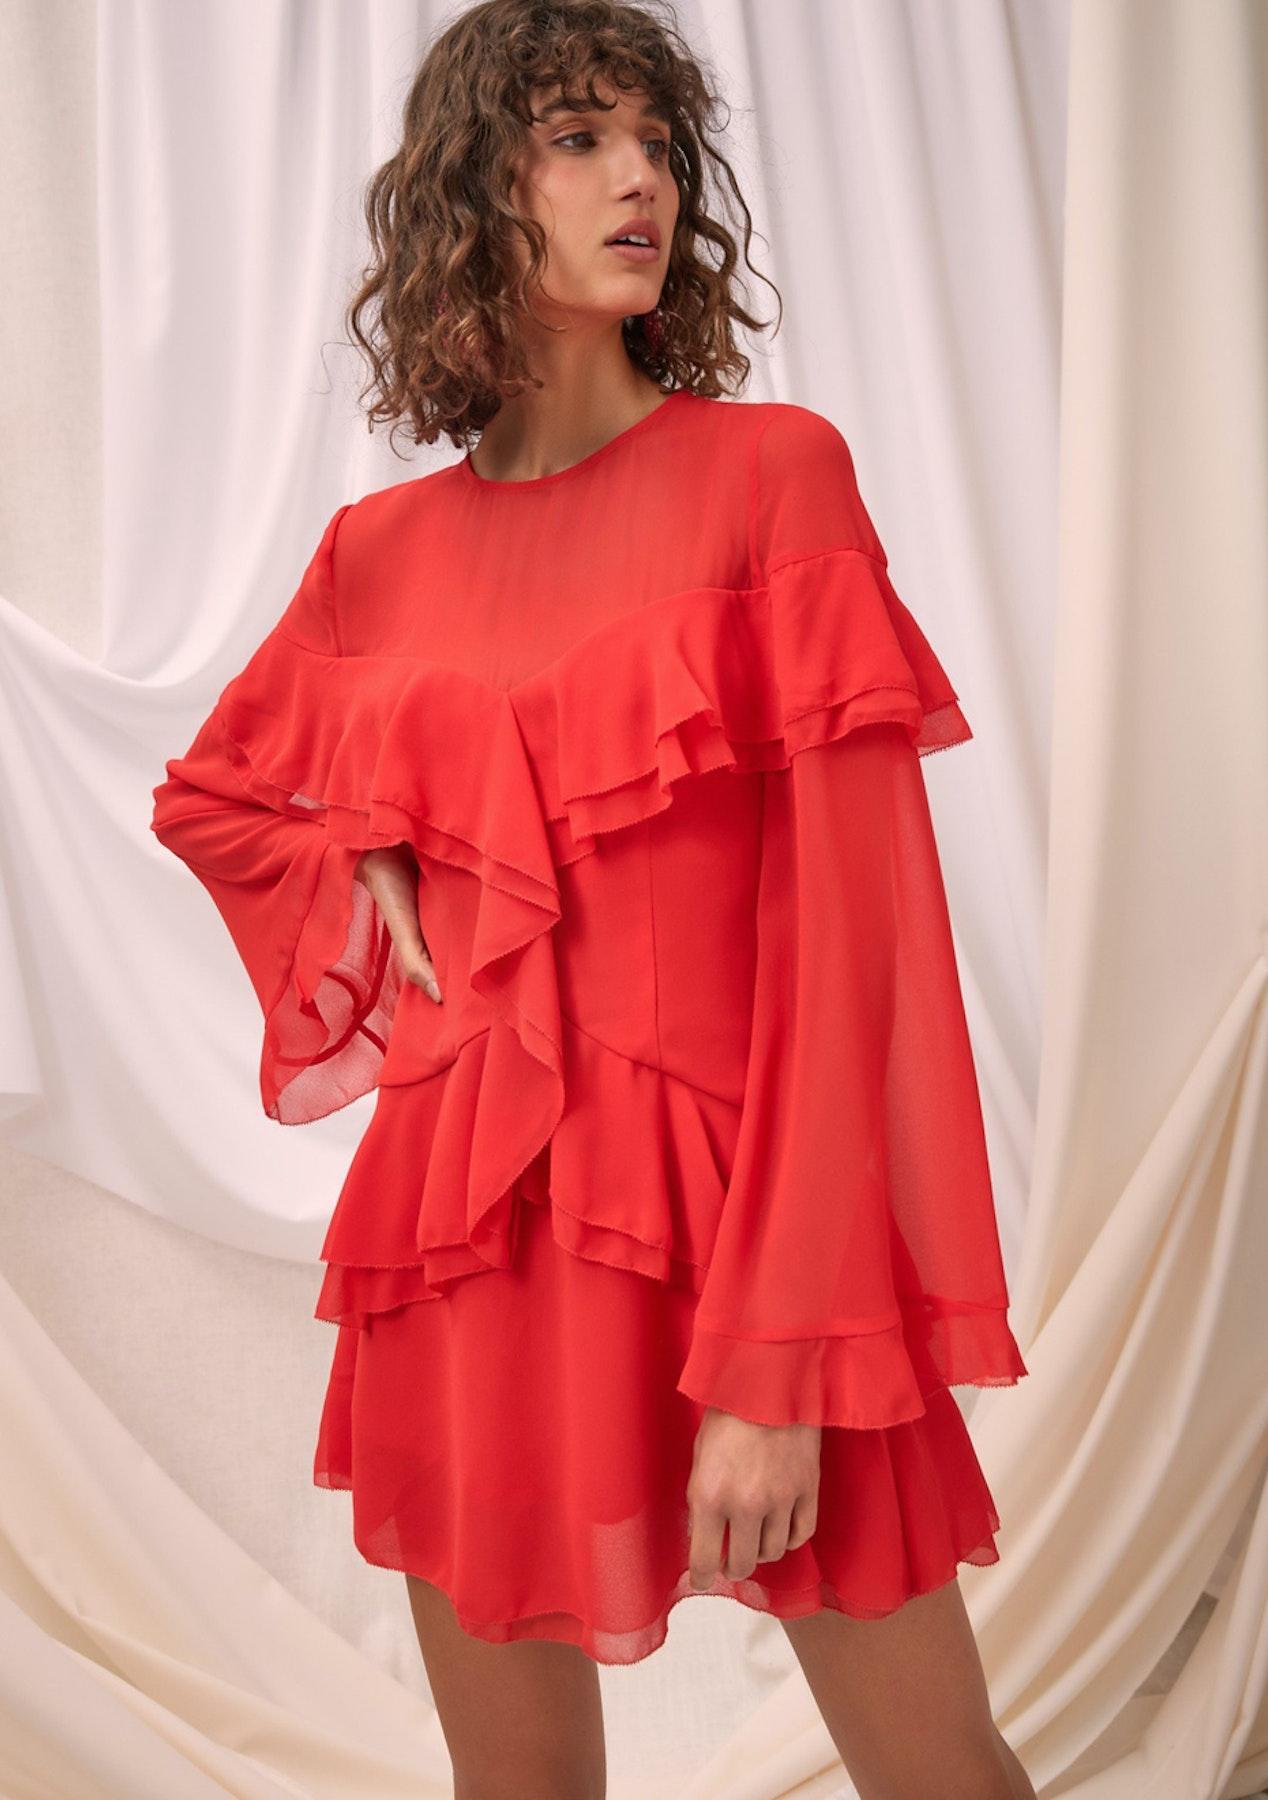 70f20dec41870 CMEO - Elude Ls Mini Dress - Chili - Designer Garage Sale - Onceit